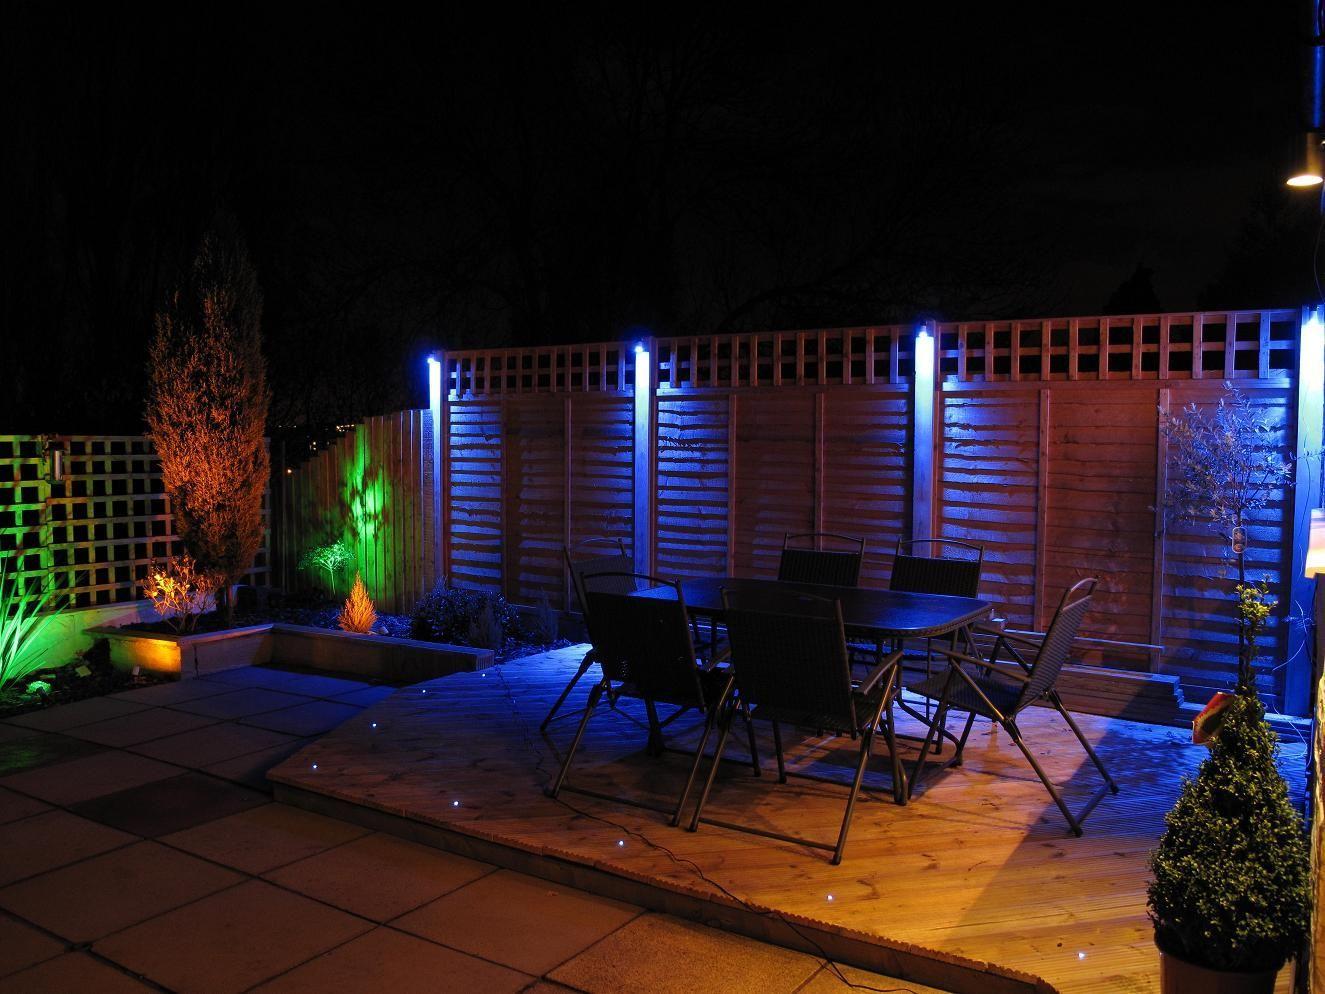 Blue Led Outdoor Spotlights Outdoor Lighting Ideas Landscape Lighting Design Backyard Lighting Garden Lighting Design